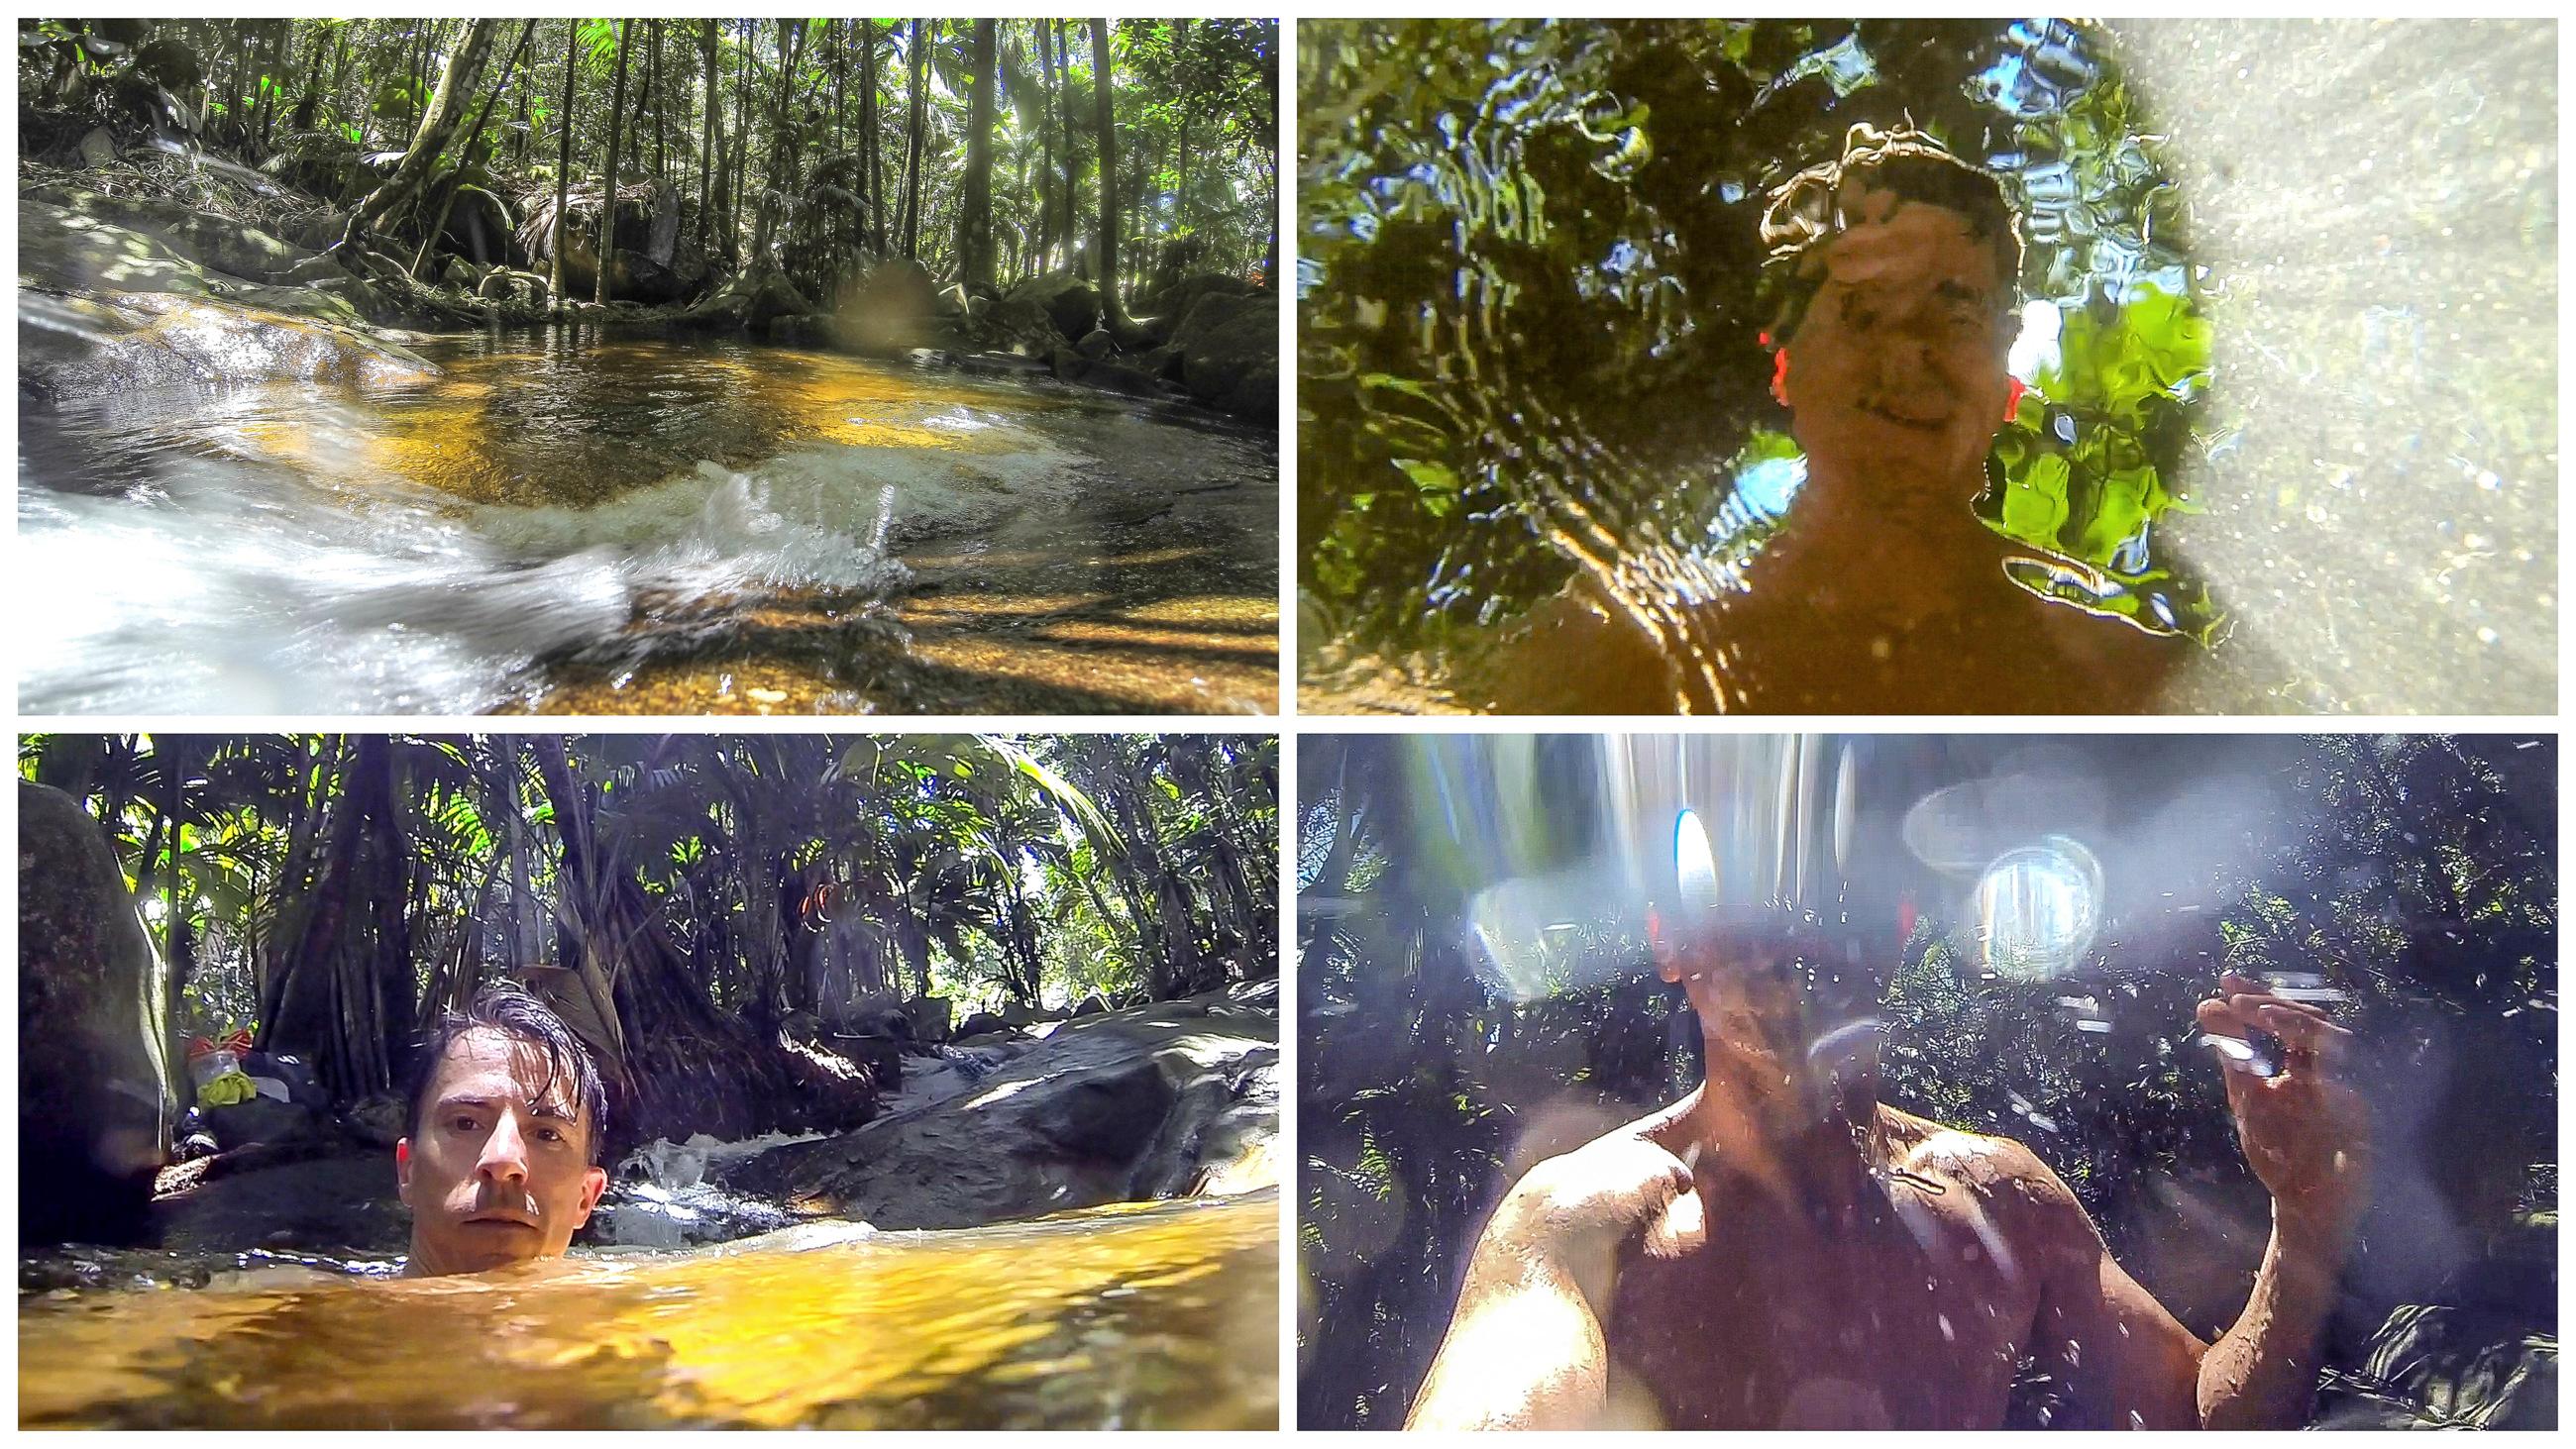 - insel-beach-wanderung-sport-laufen-urlaub-foto-bericht-blog-seychellen-afrika-abu-dhabi-acc88quator-bilder-bericht-fotos-alf-dahl-traveller-travelthon